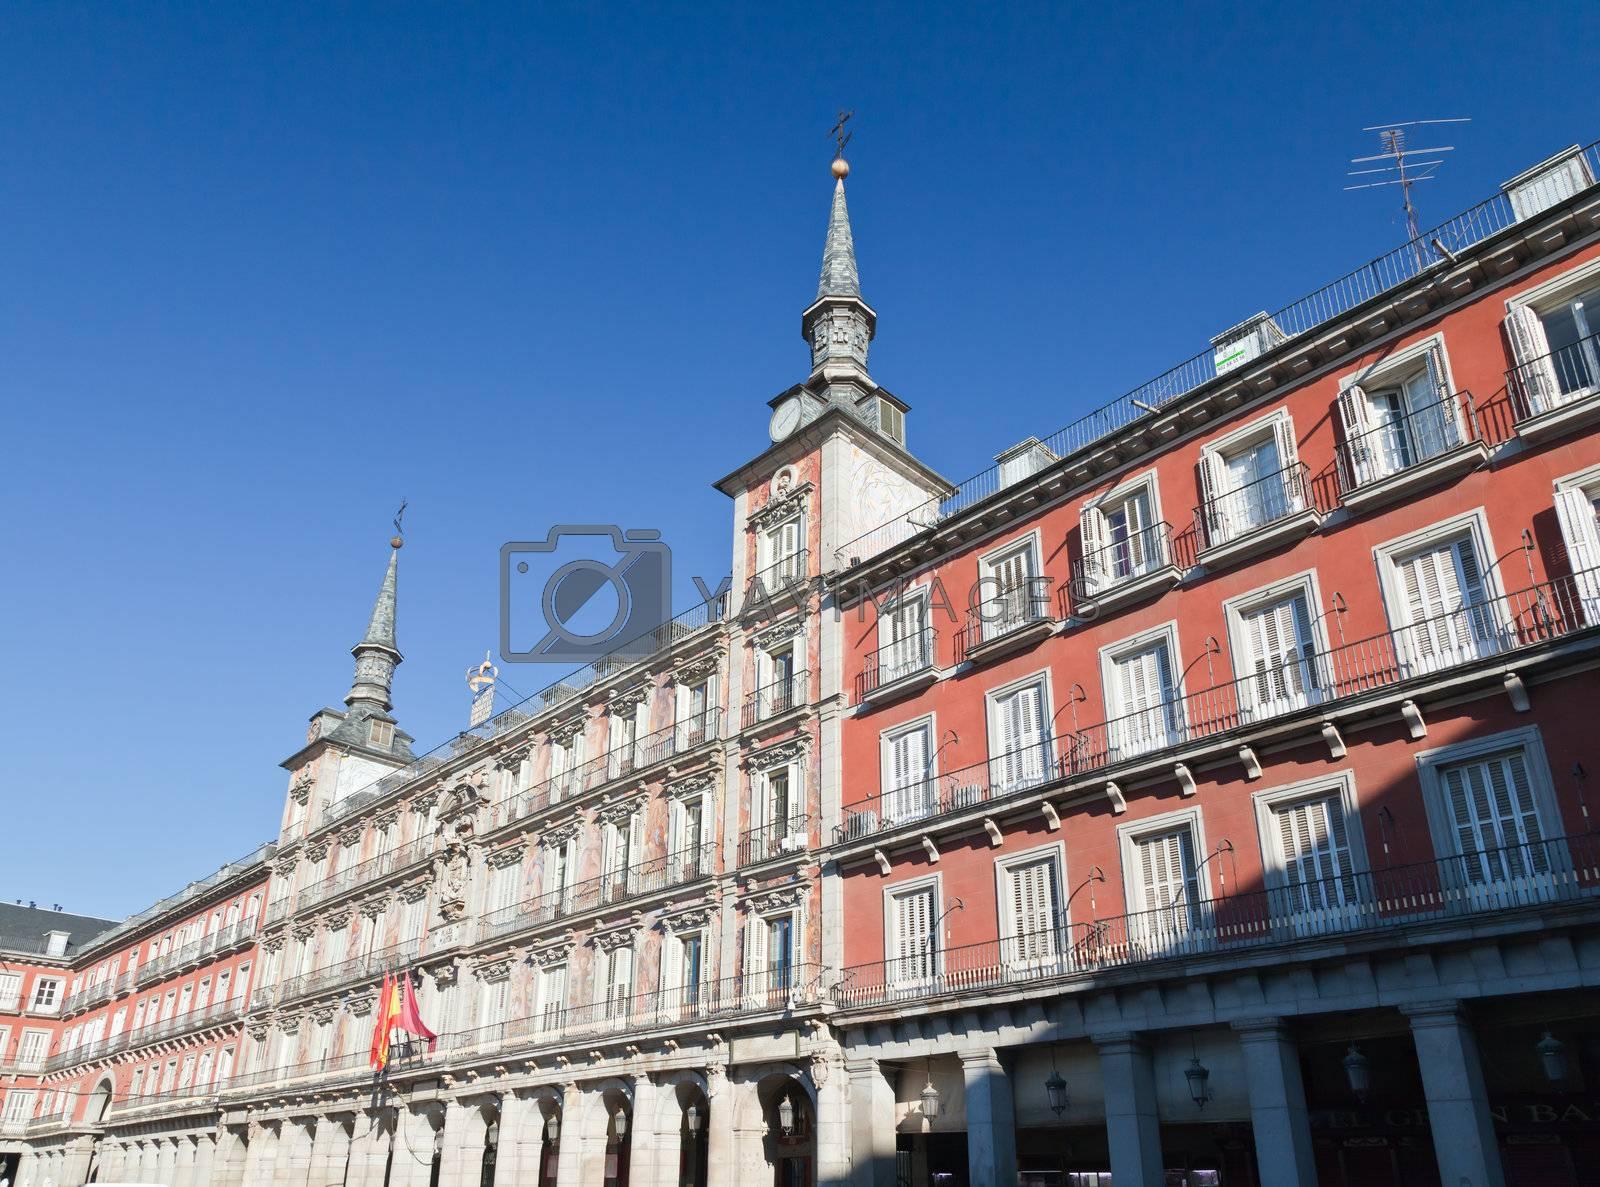 The Plaza Mayor (Main Square) in Madrid, Spain